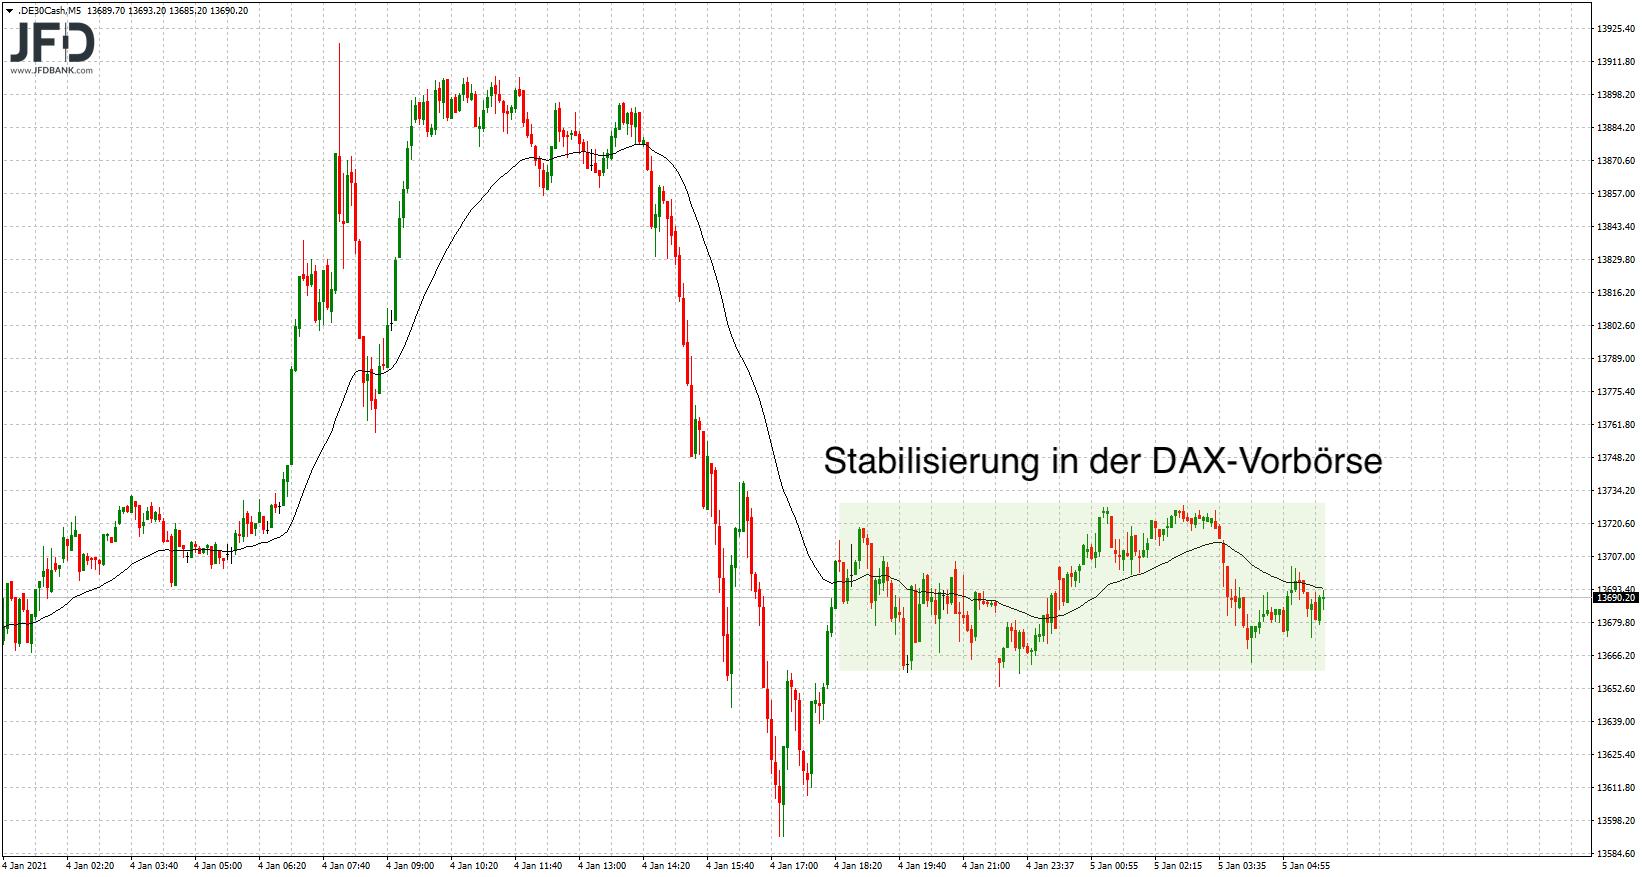 DAX-Vorbörse stabil an 13.700